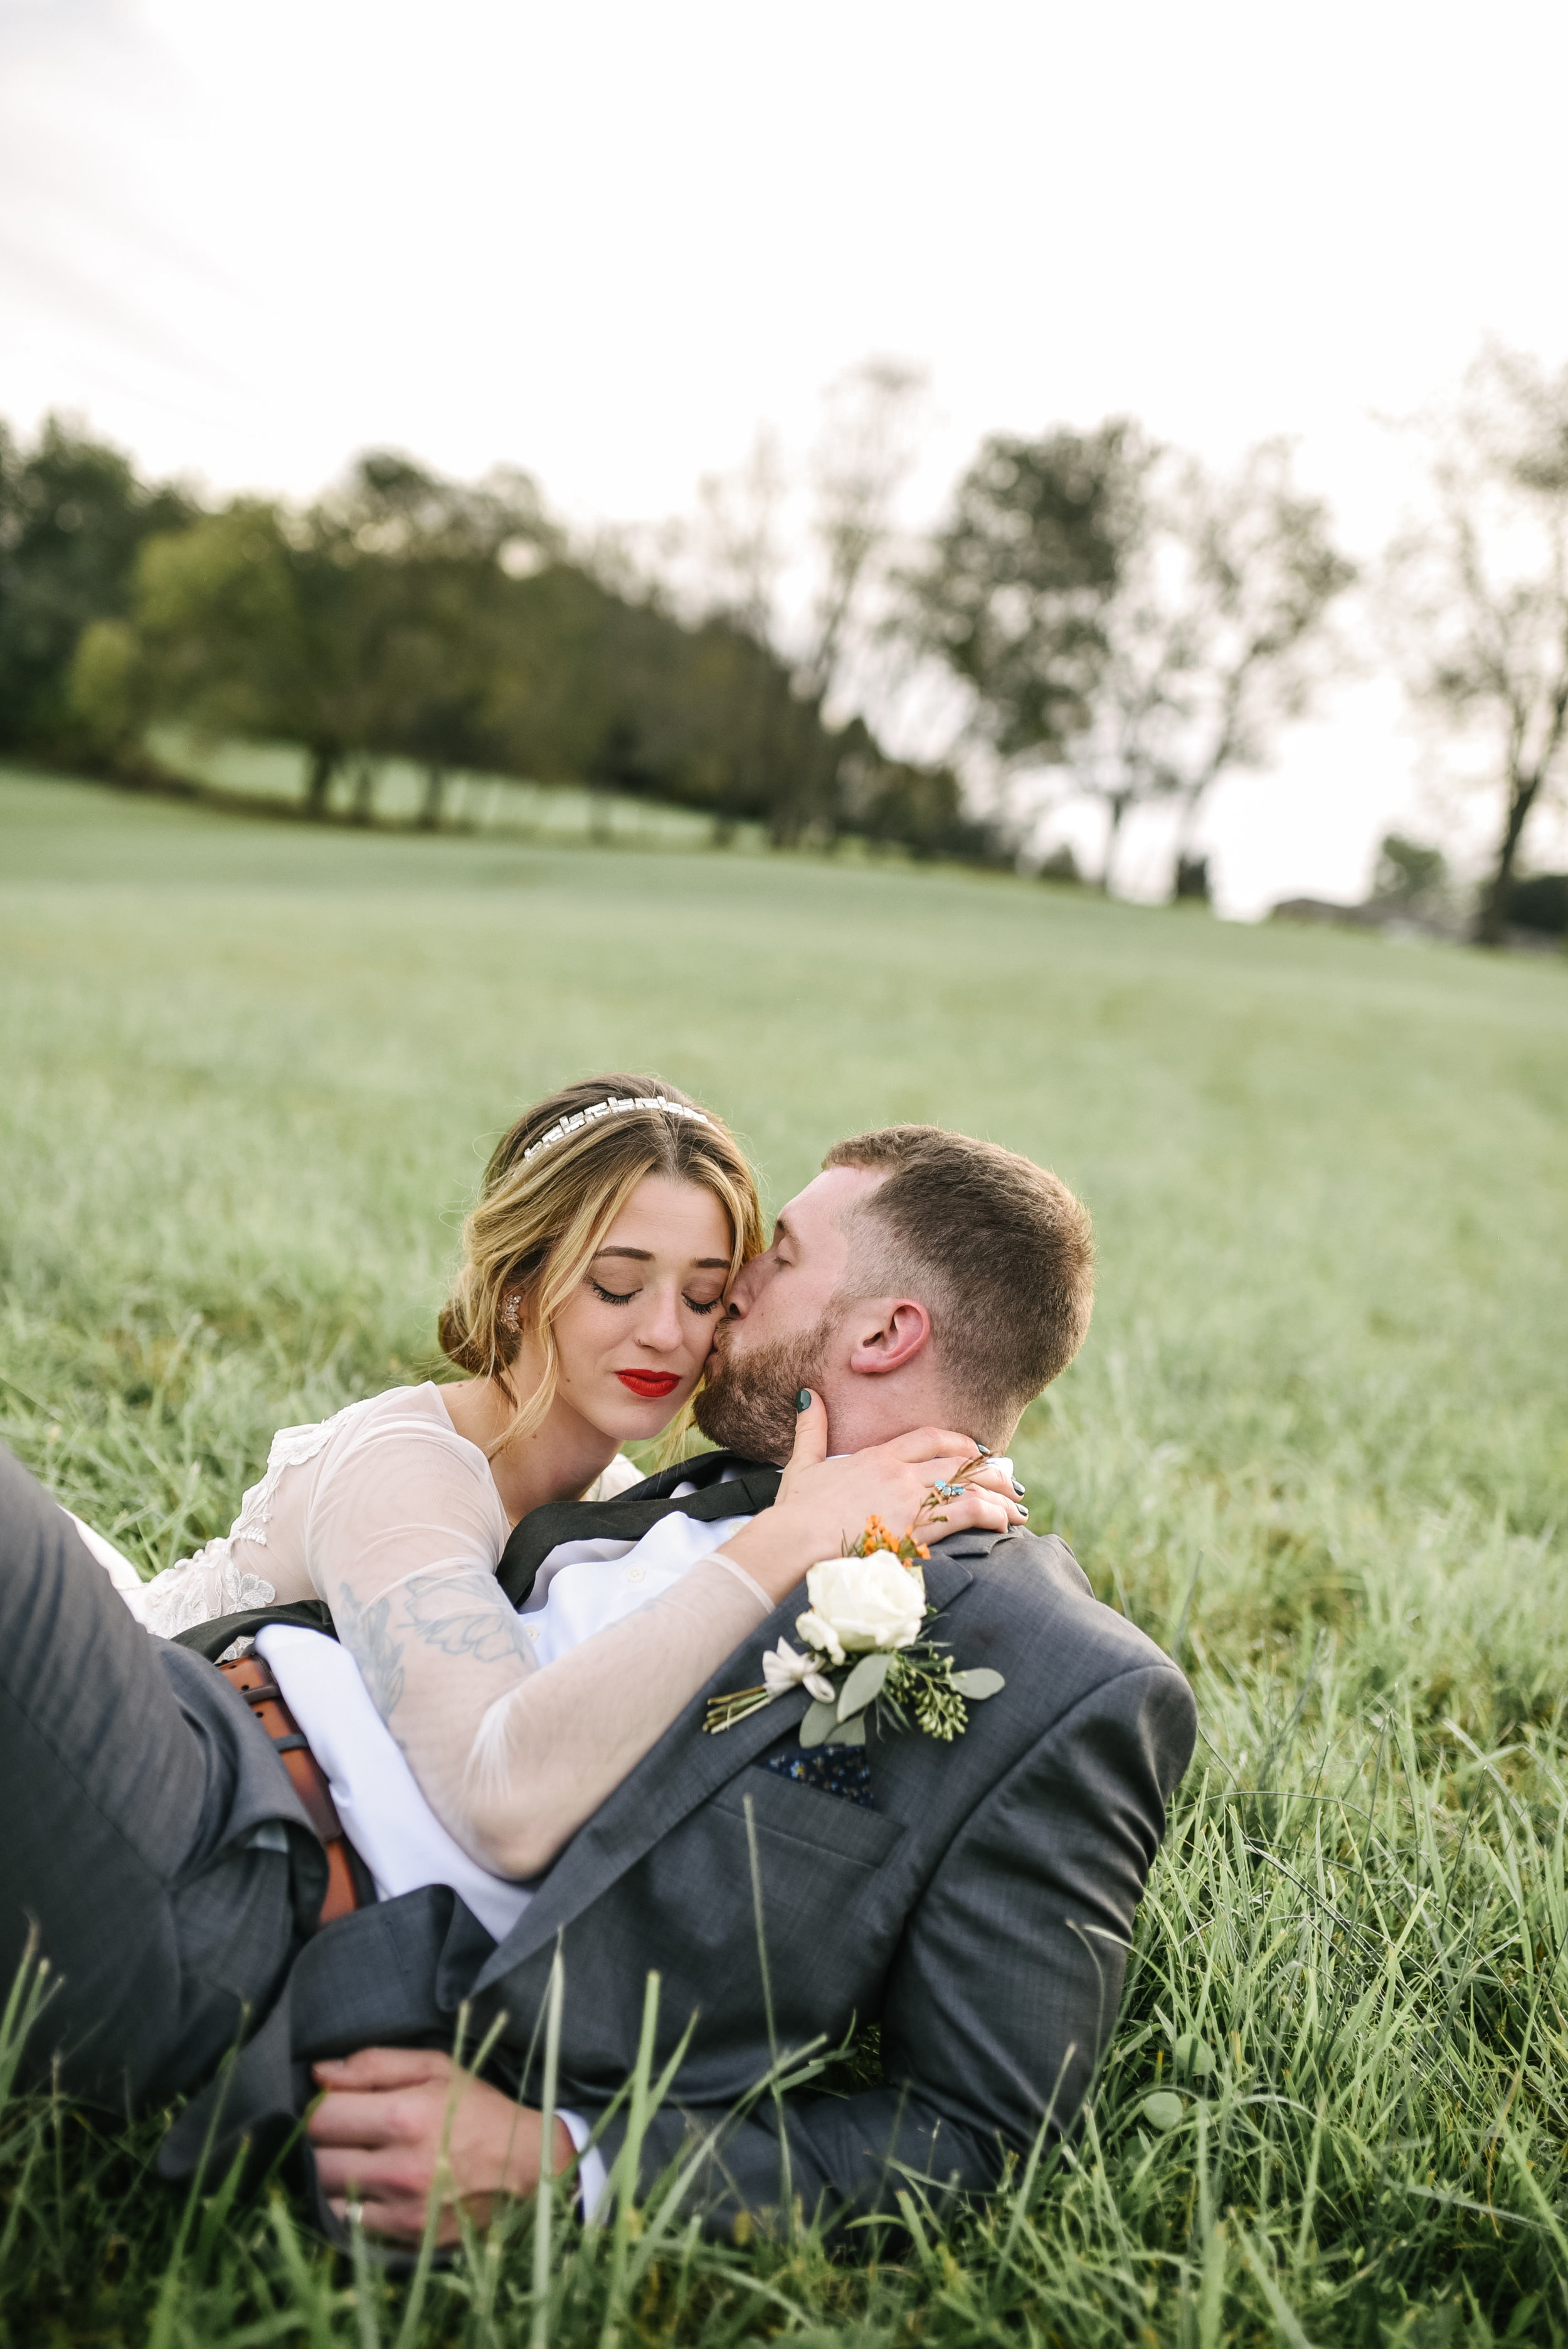 agpcollective_korn_coupleportraits-0601.jpg